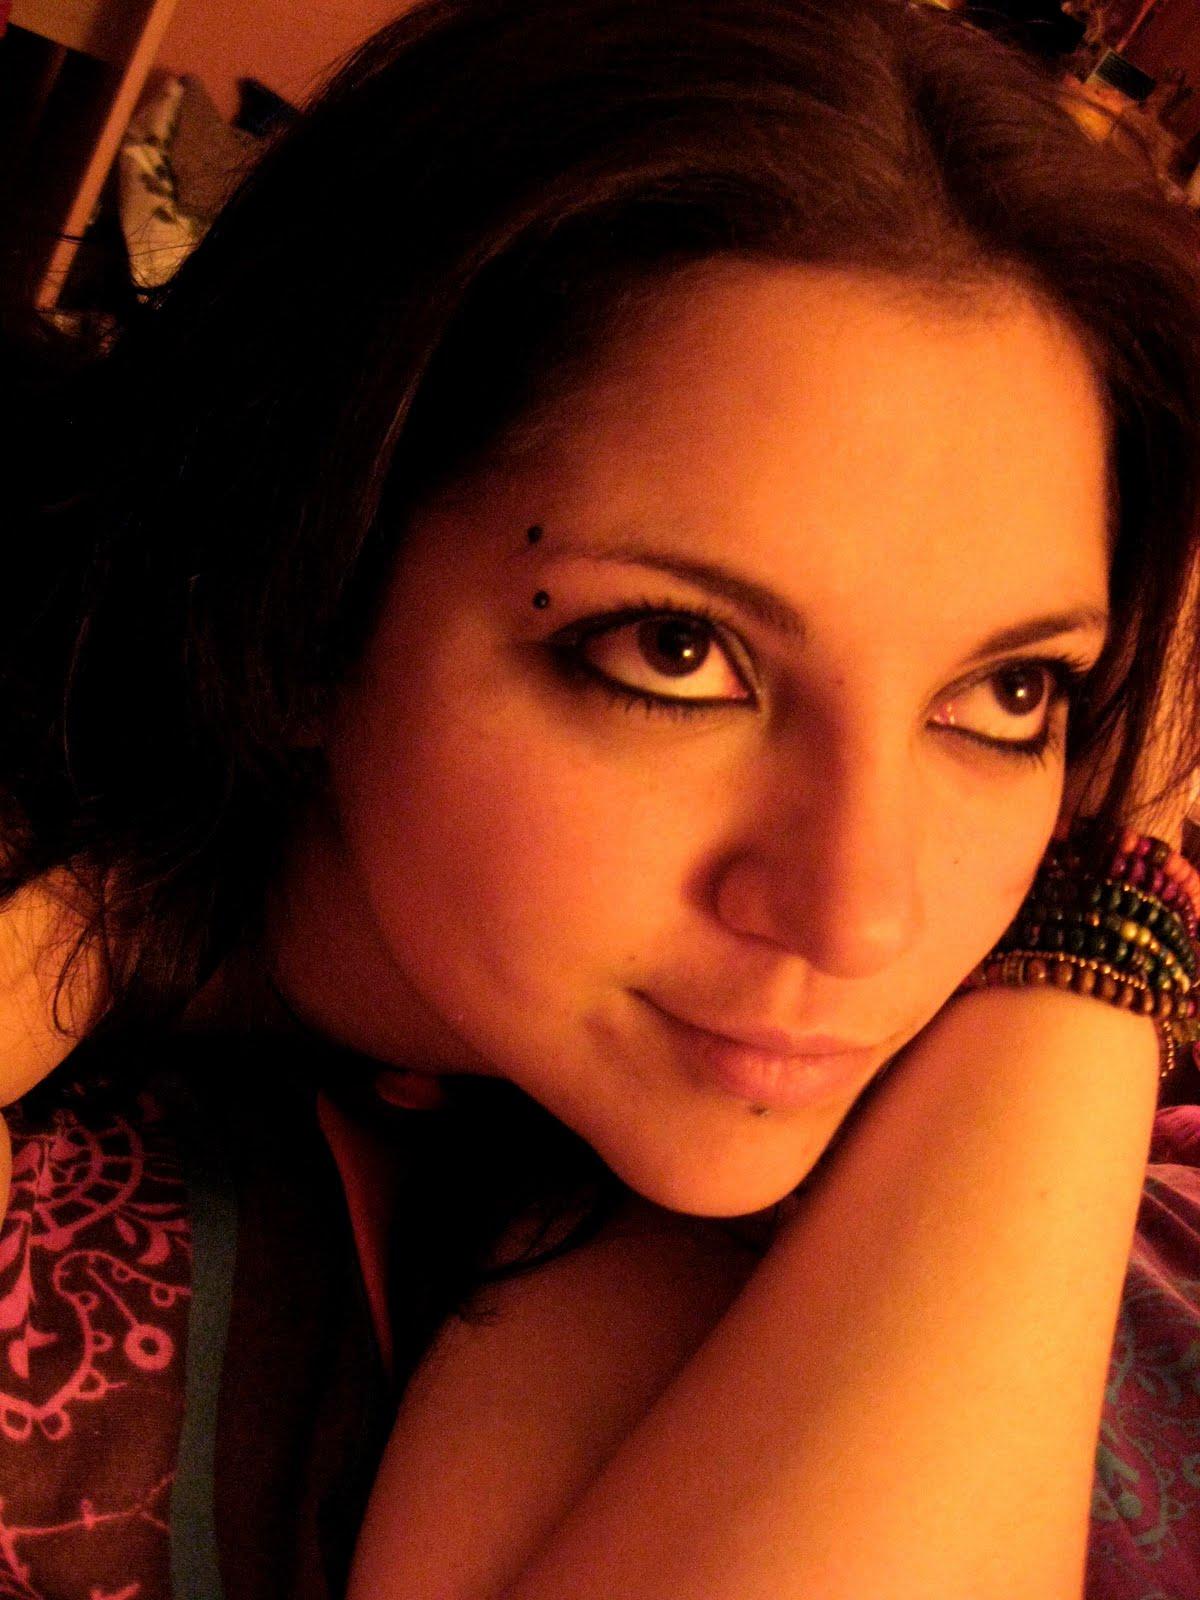 http://1.bp.blogspot.com/_15T-PF1fvOI/TRaIRhwChlI/AAAAAAAAALk/OIgCbh4LXy8/s1600/IMG_2691.jpg